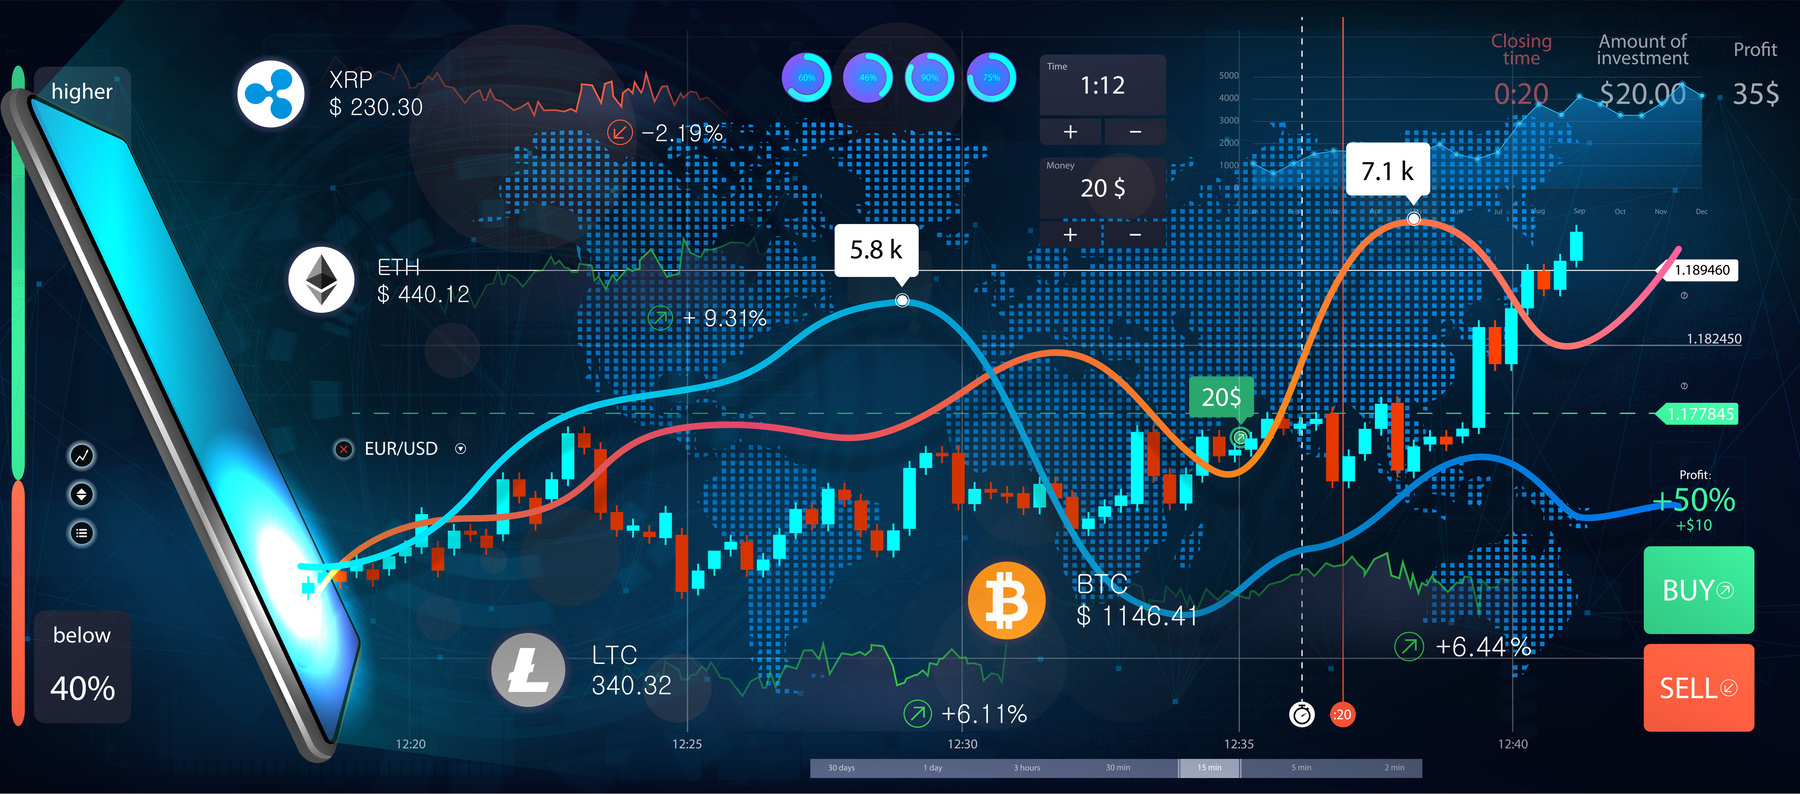 Aktueller Bitcoin Wert wieder ueber 50.000 USD - Charts Kryptowaehrung